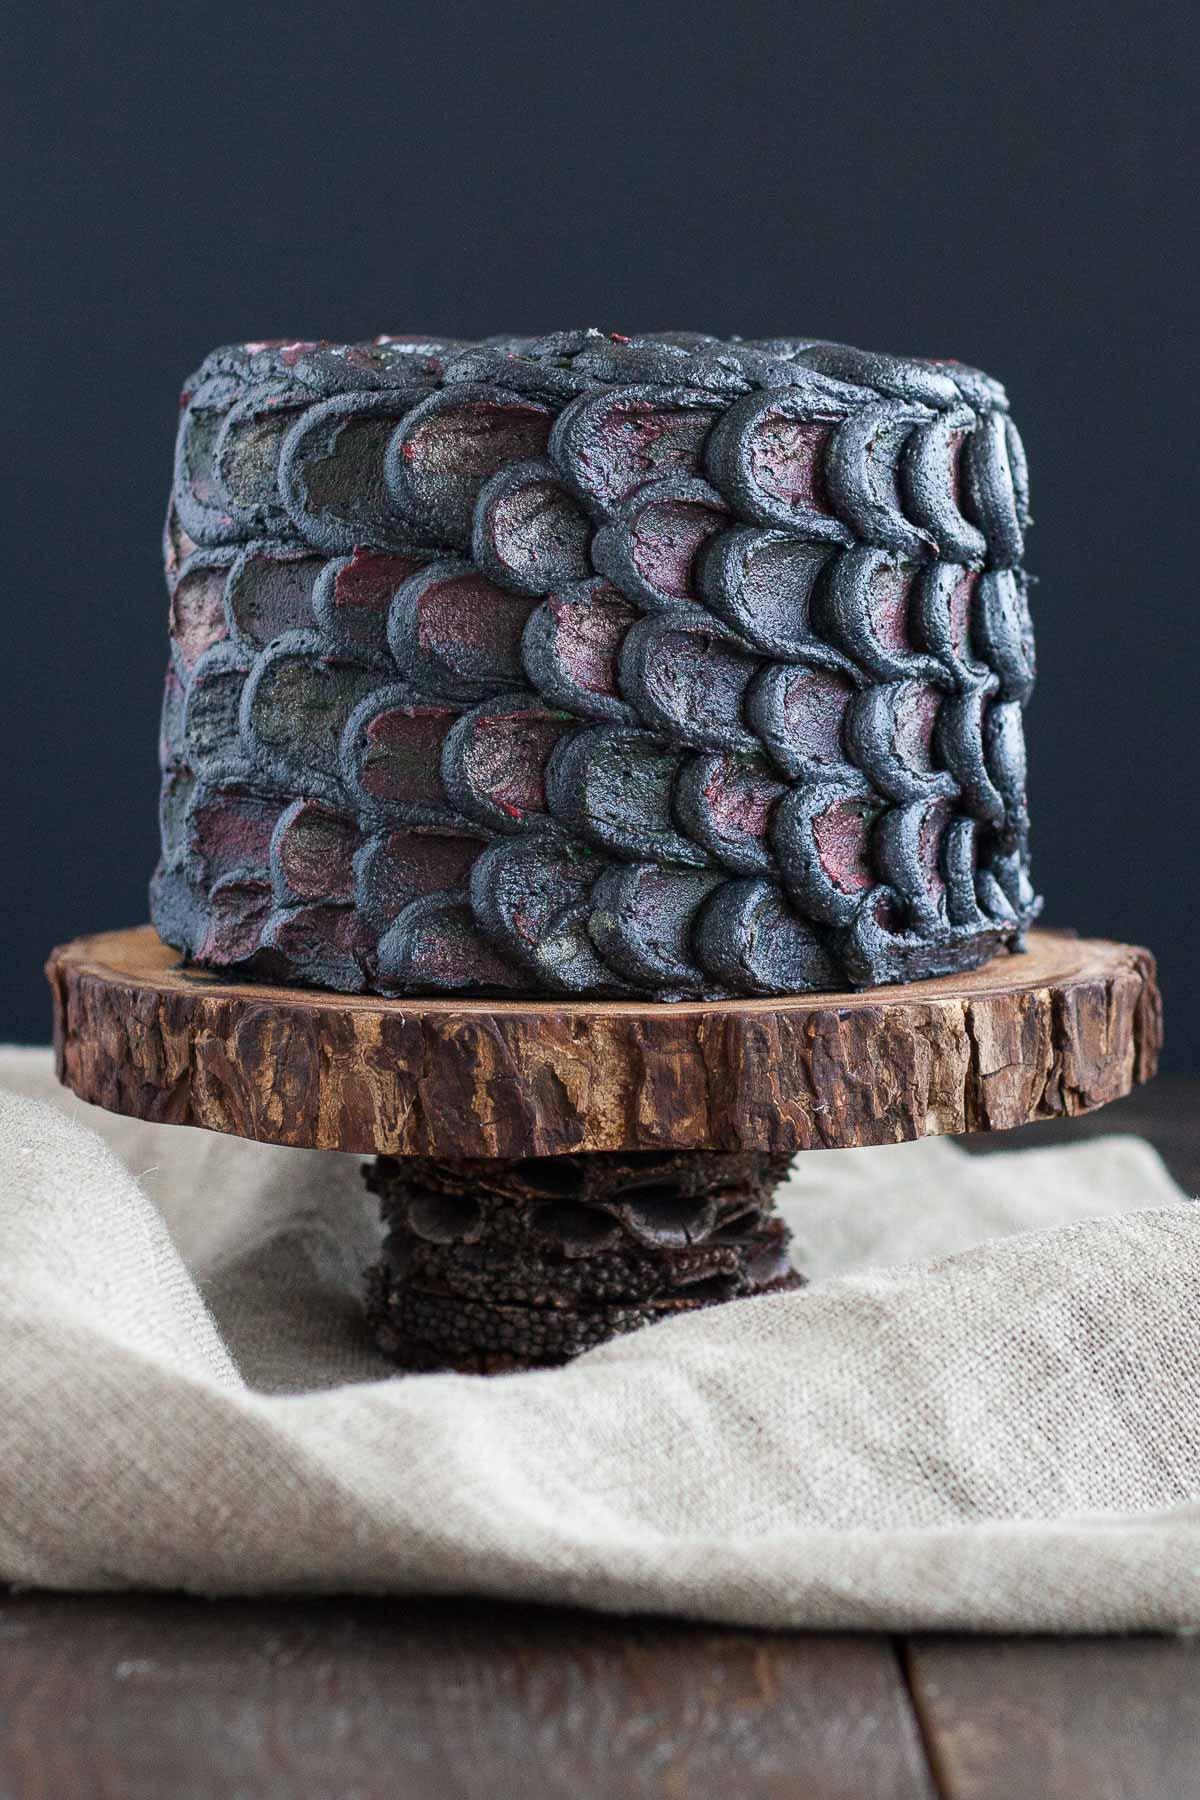 Dragon scale cake